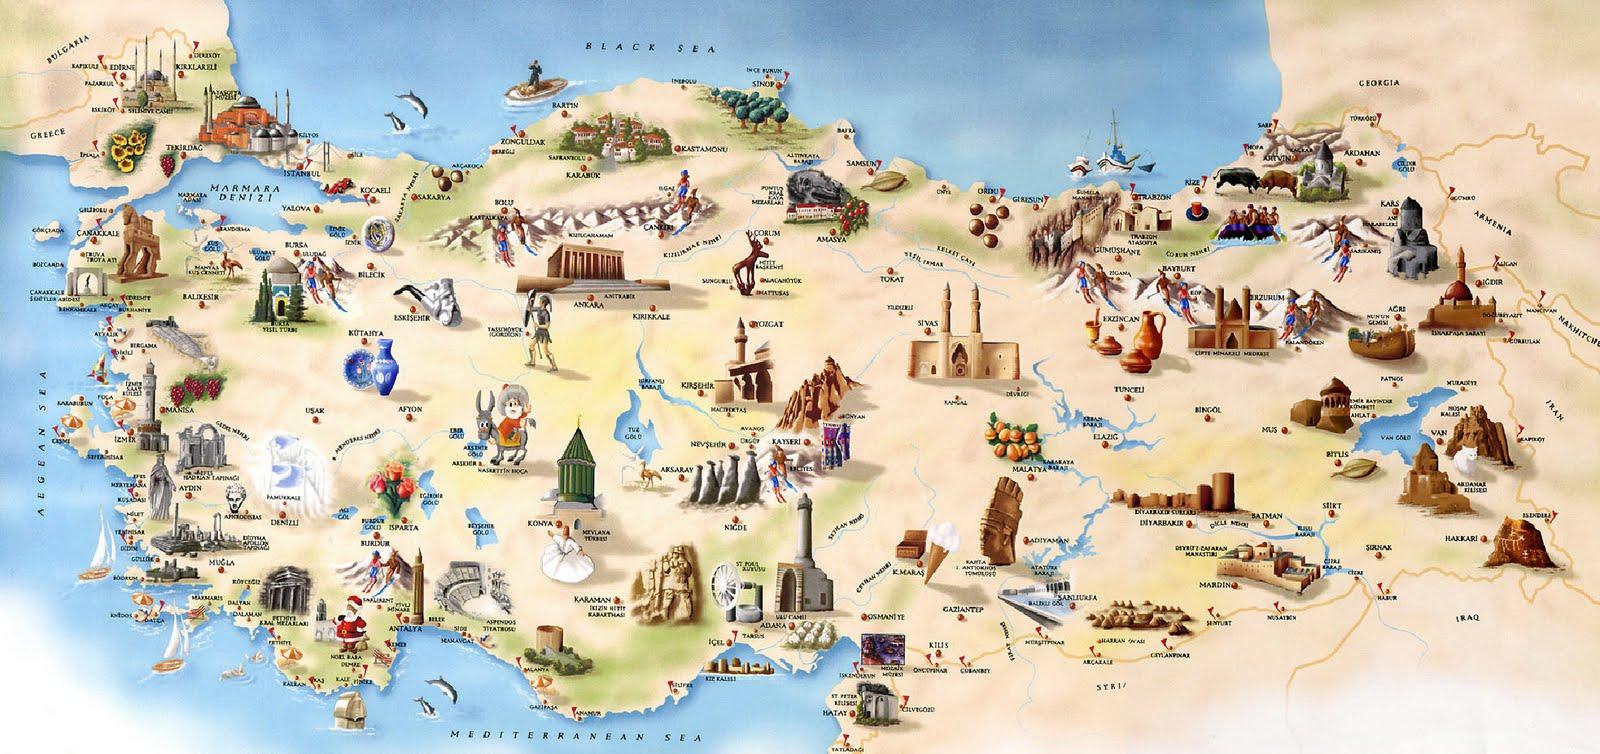 Fantasy Life World Map.Telecanter S Receding Rules Map Feature Symbols